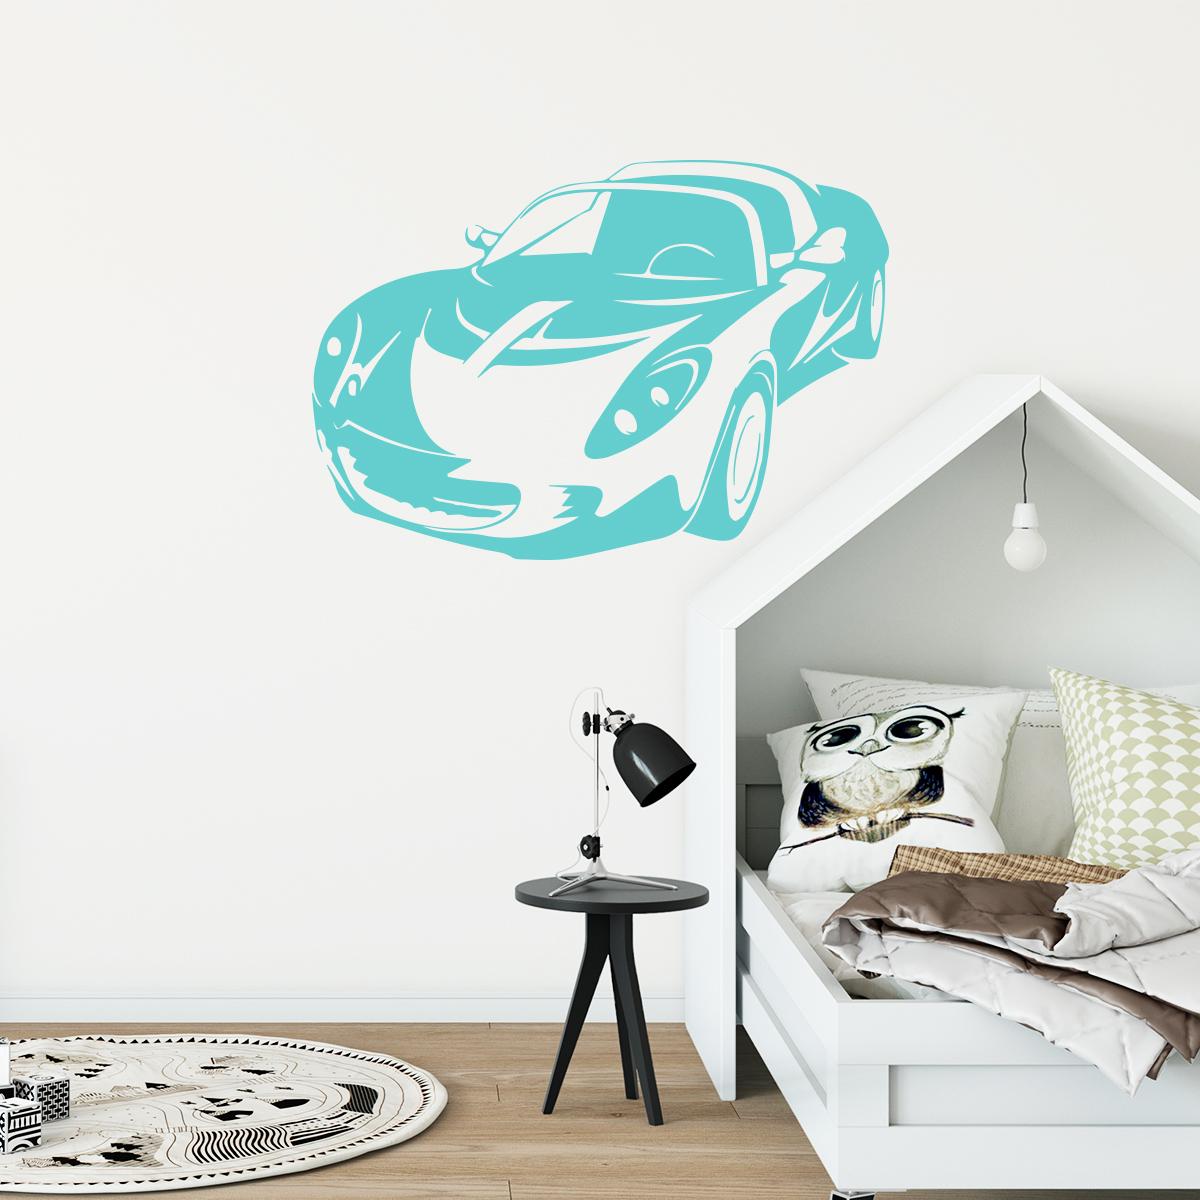 Sticker voiture dynamique stickers chambre ado gar on for Stickers pour chambre ado garcon